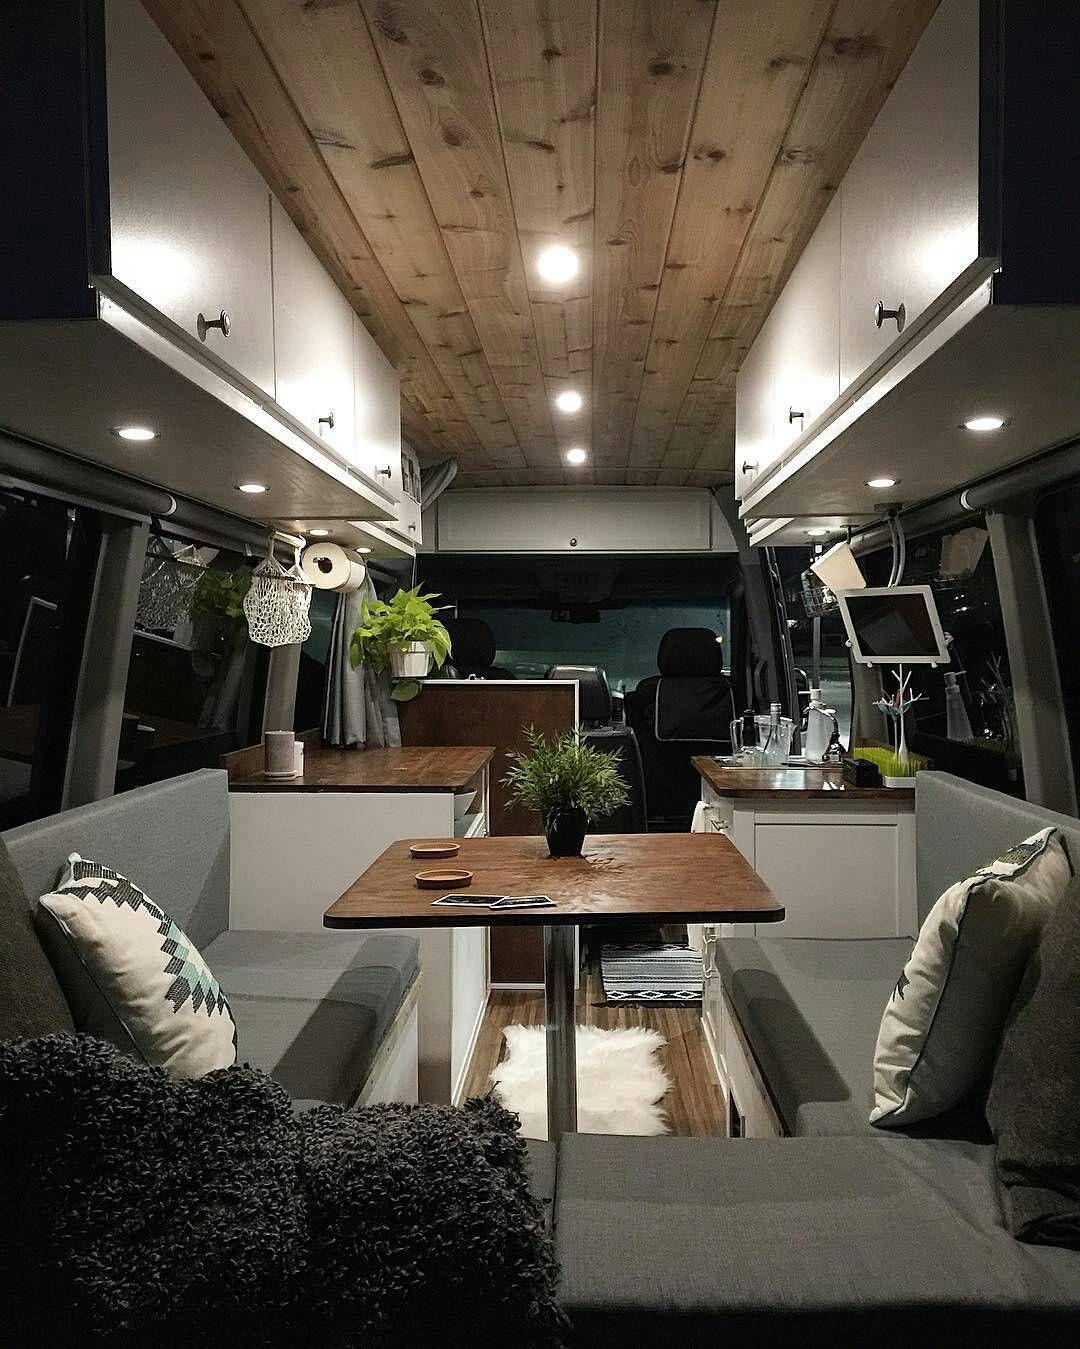 50 Incredible And Easy Tips RV Camper Van Storage Ideas